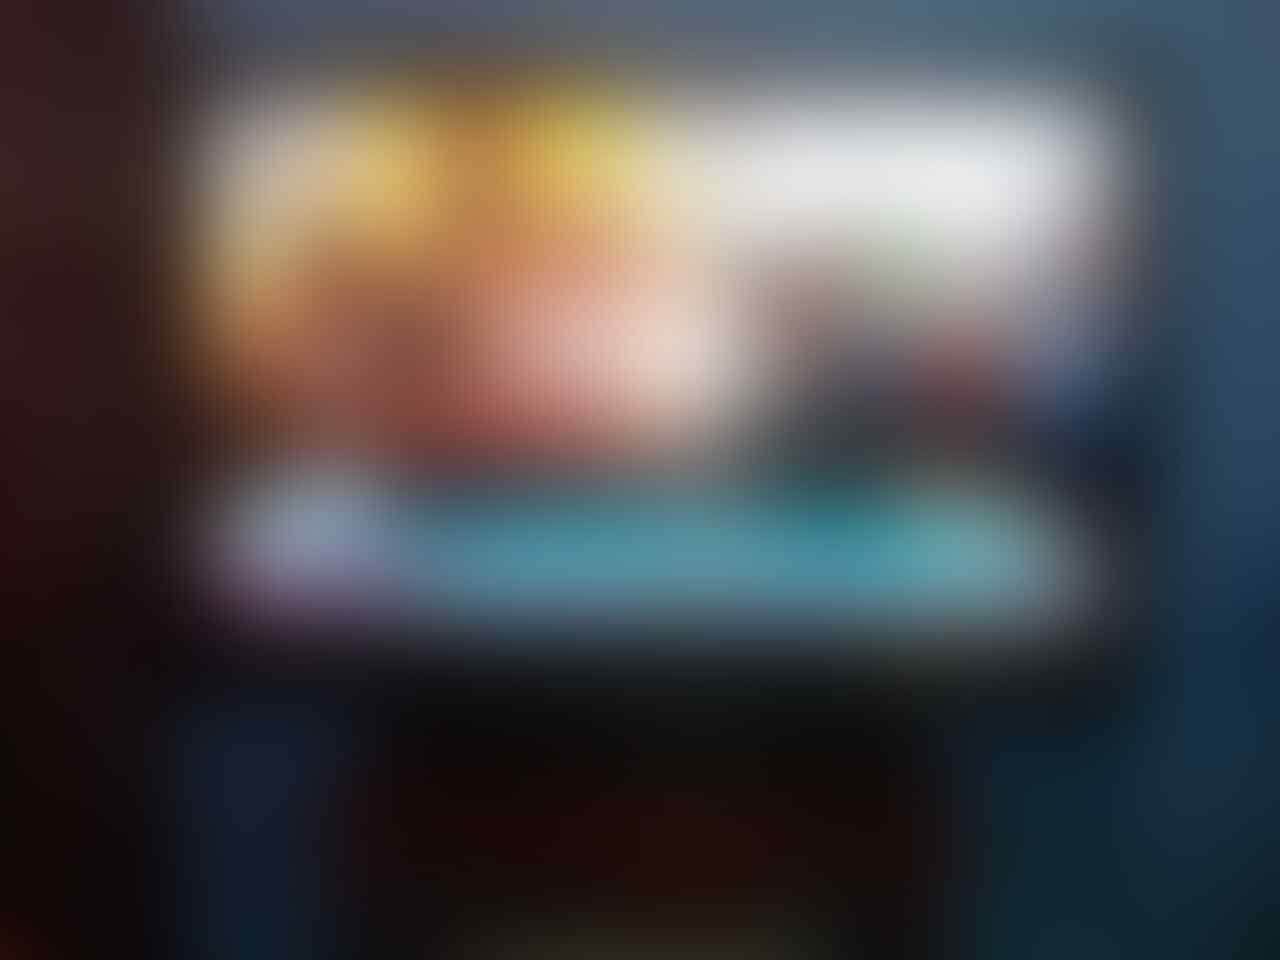 led colour tv sharp aquos full hd1080p model lc40-le820m + remote kds 98% jos...